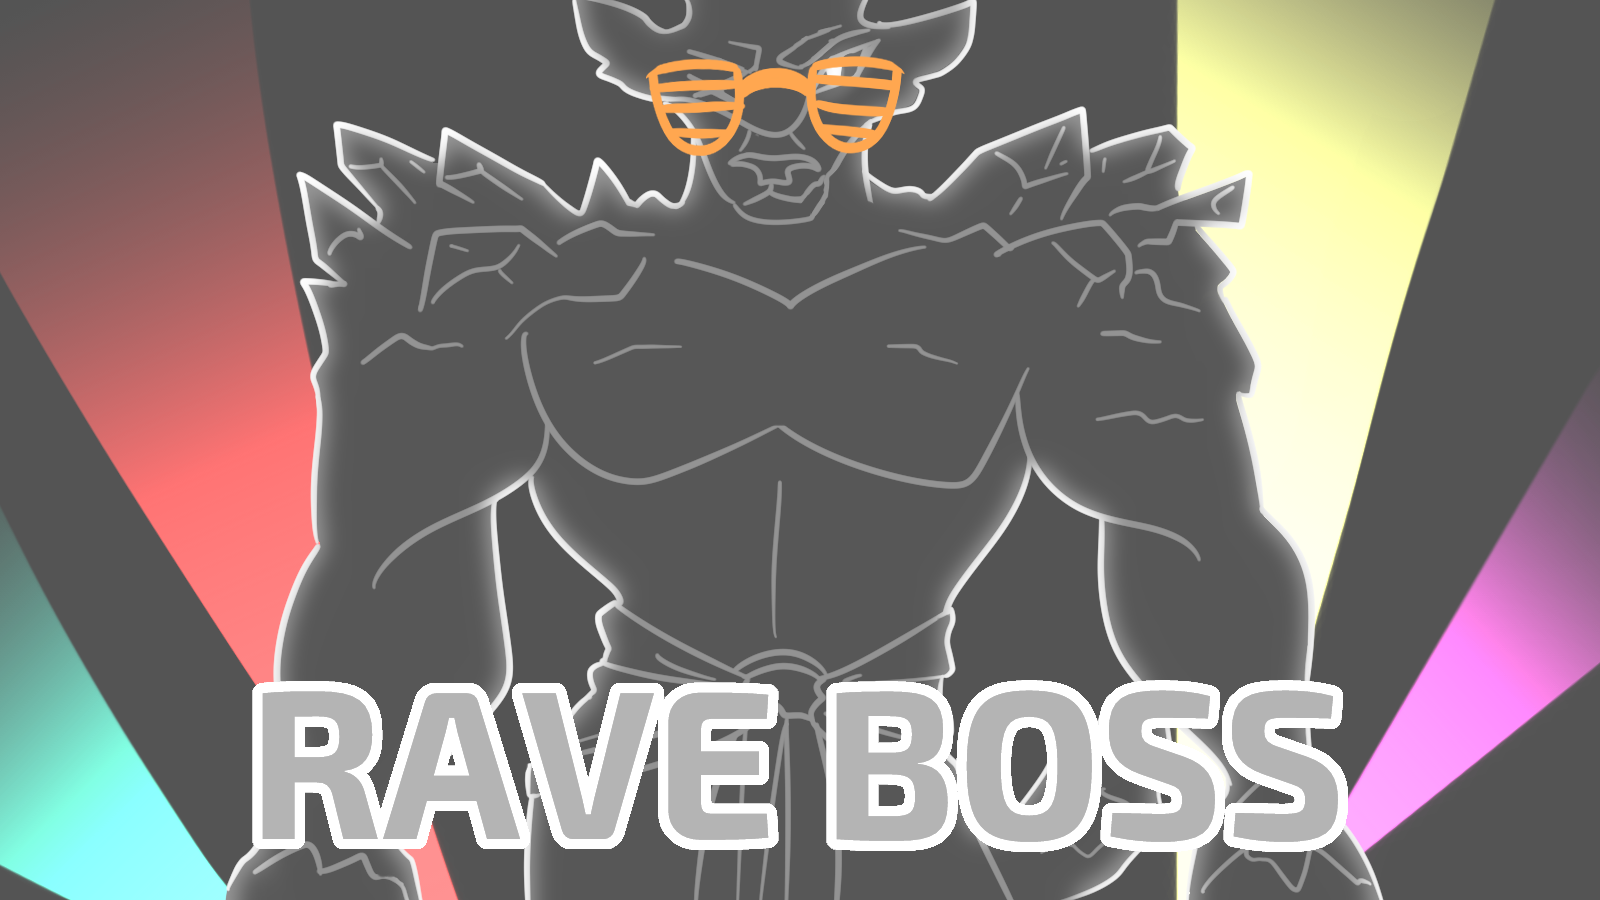 RAVE BOSS